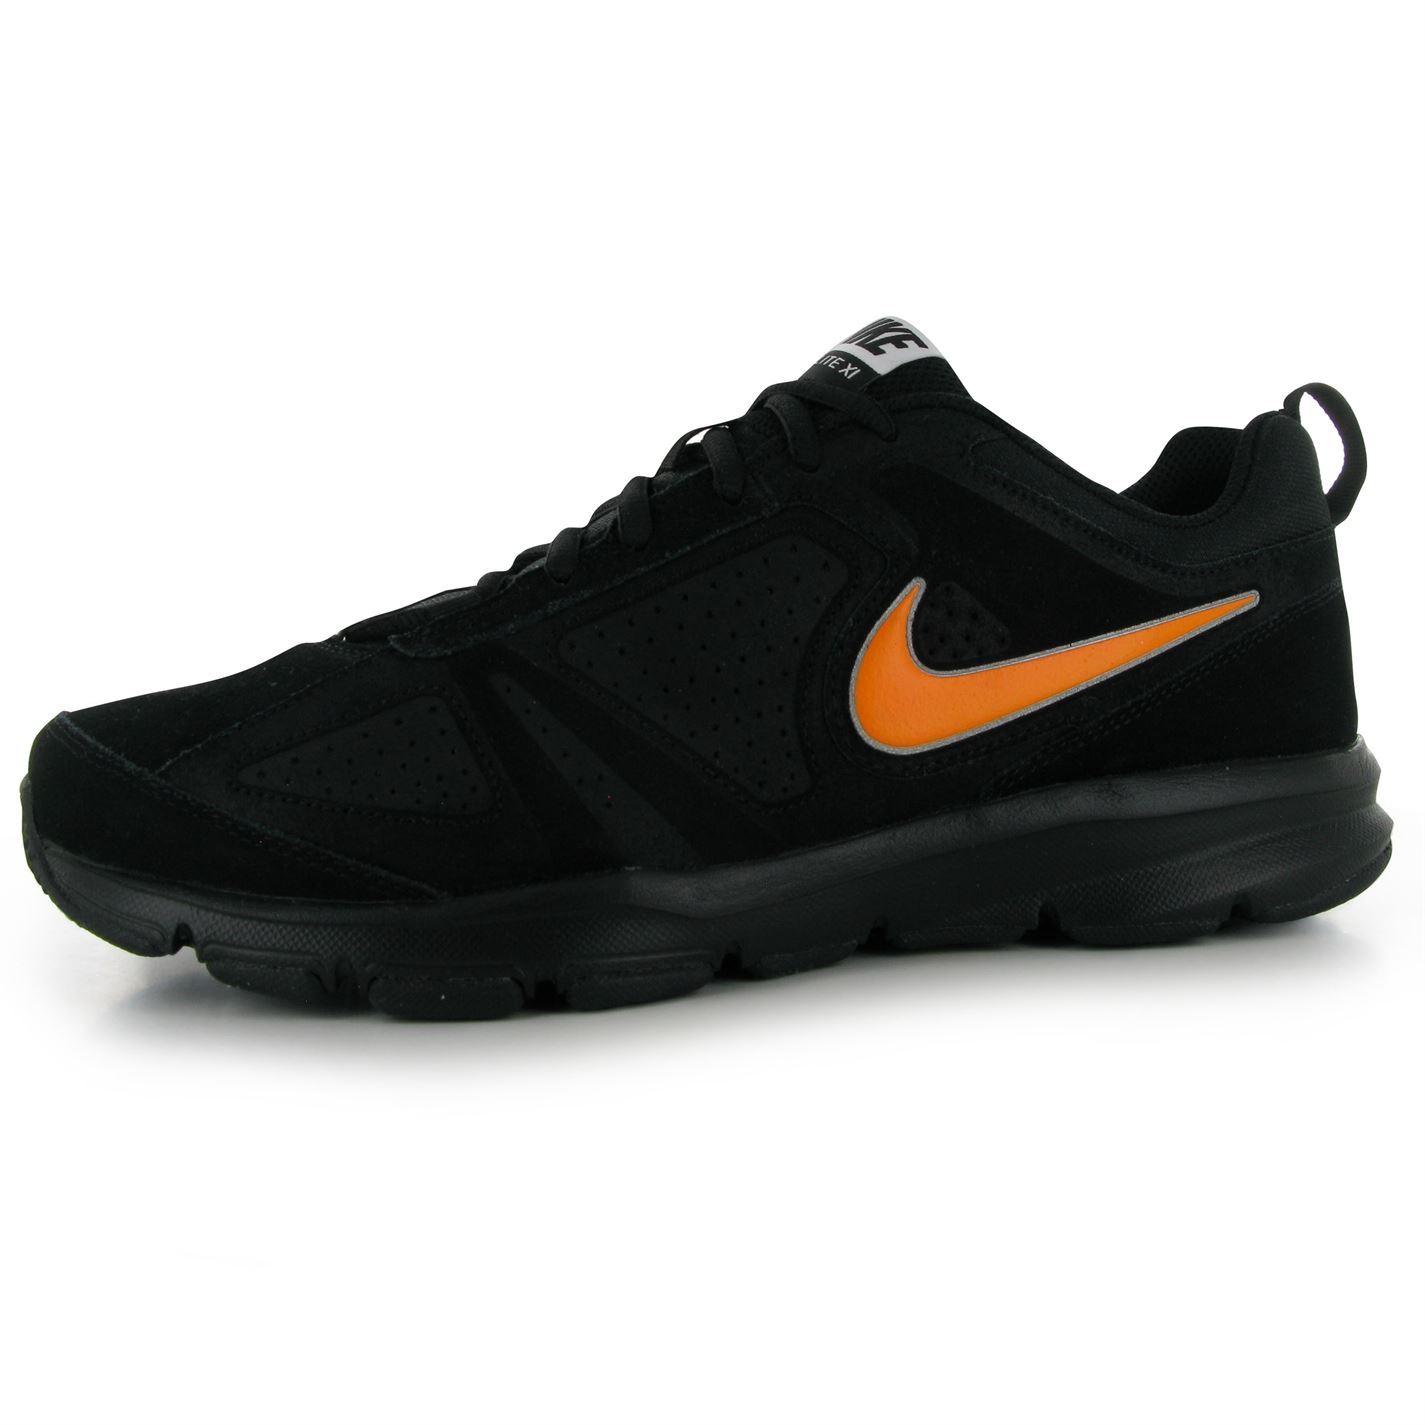 Nike trainers t lite xi women s sneakers sports runing shoes black - Nike T Lite 11 Nubuck Training Shoes Mens Black Orange Fitness Trainers Sneakers